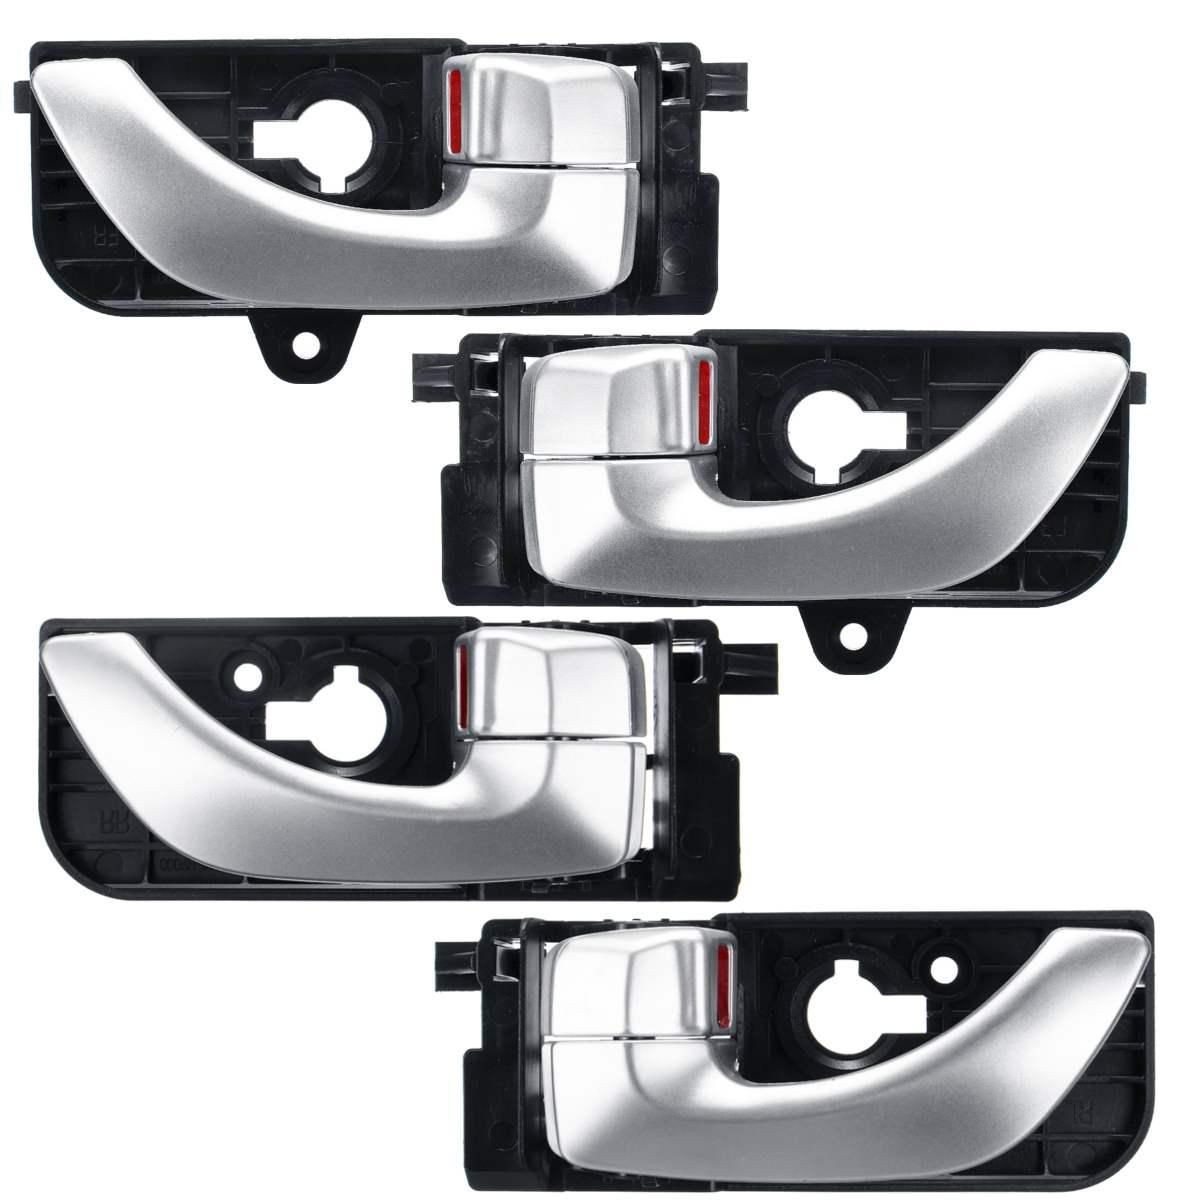 4pcs Set Front Rear Inside Door Handle For Hyundai Sonata 2005 2006 2007 2008 836203k020xz 836103k020xz Interior Door Handles Aliexpress